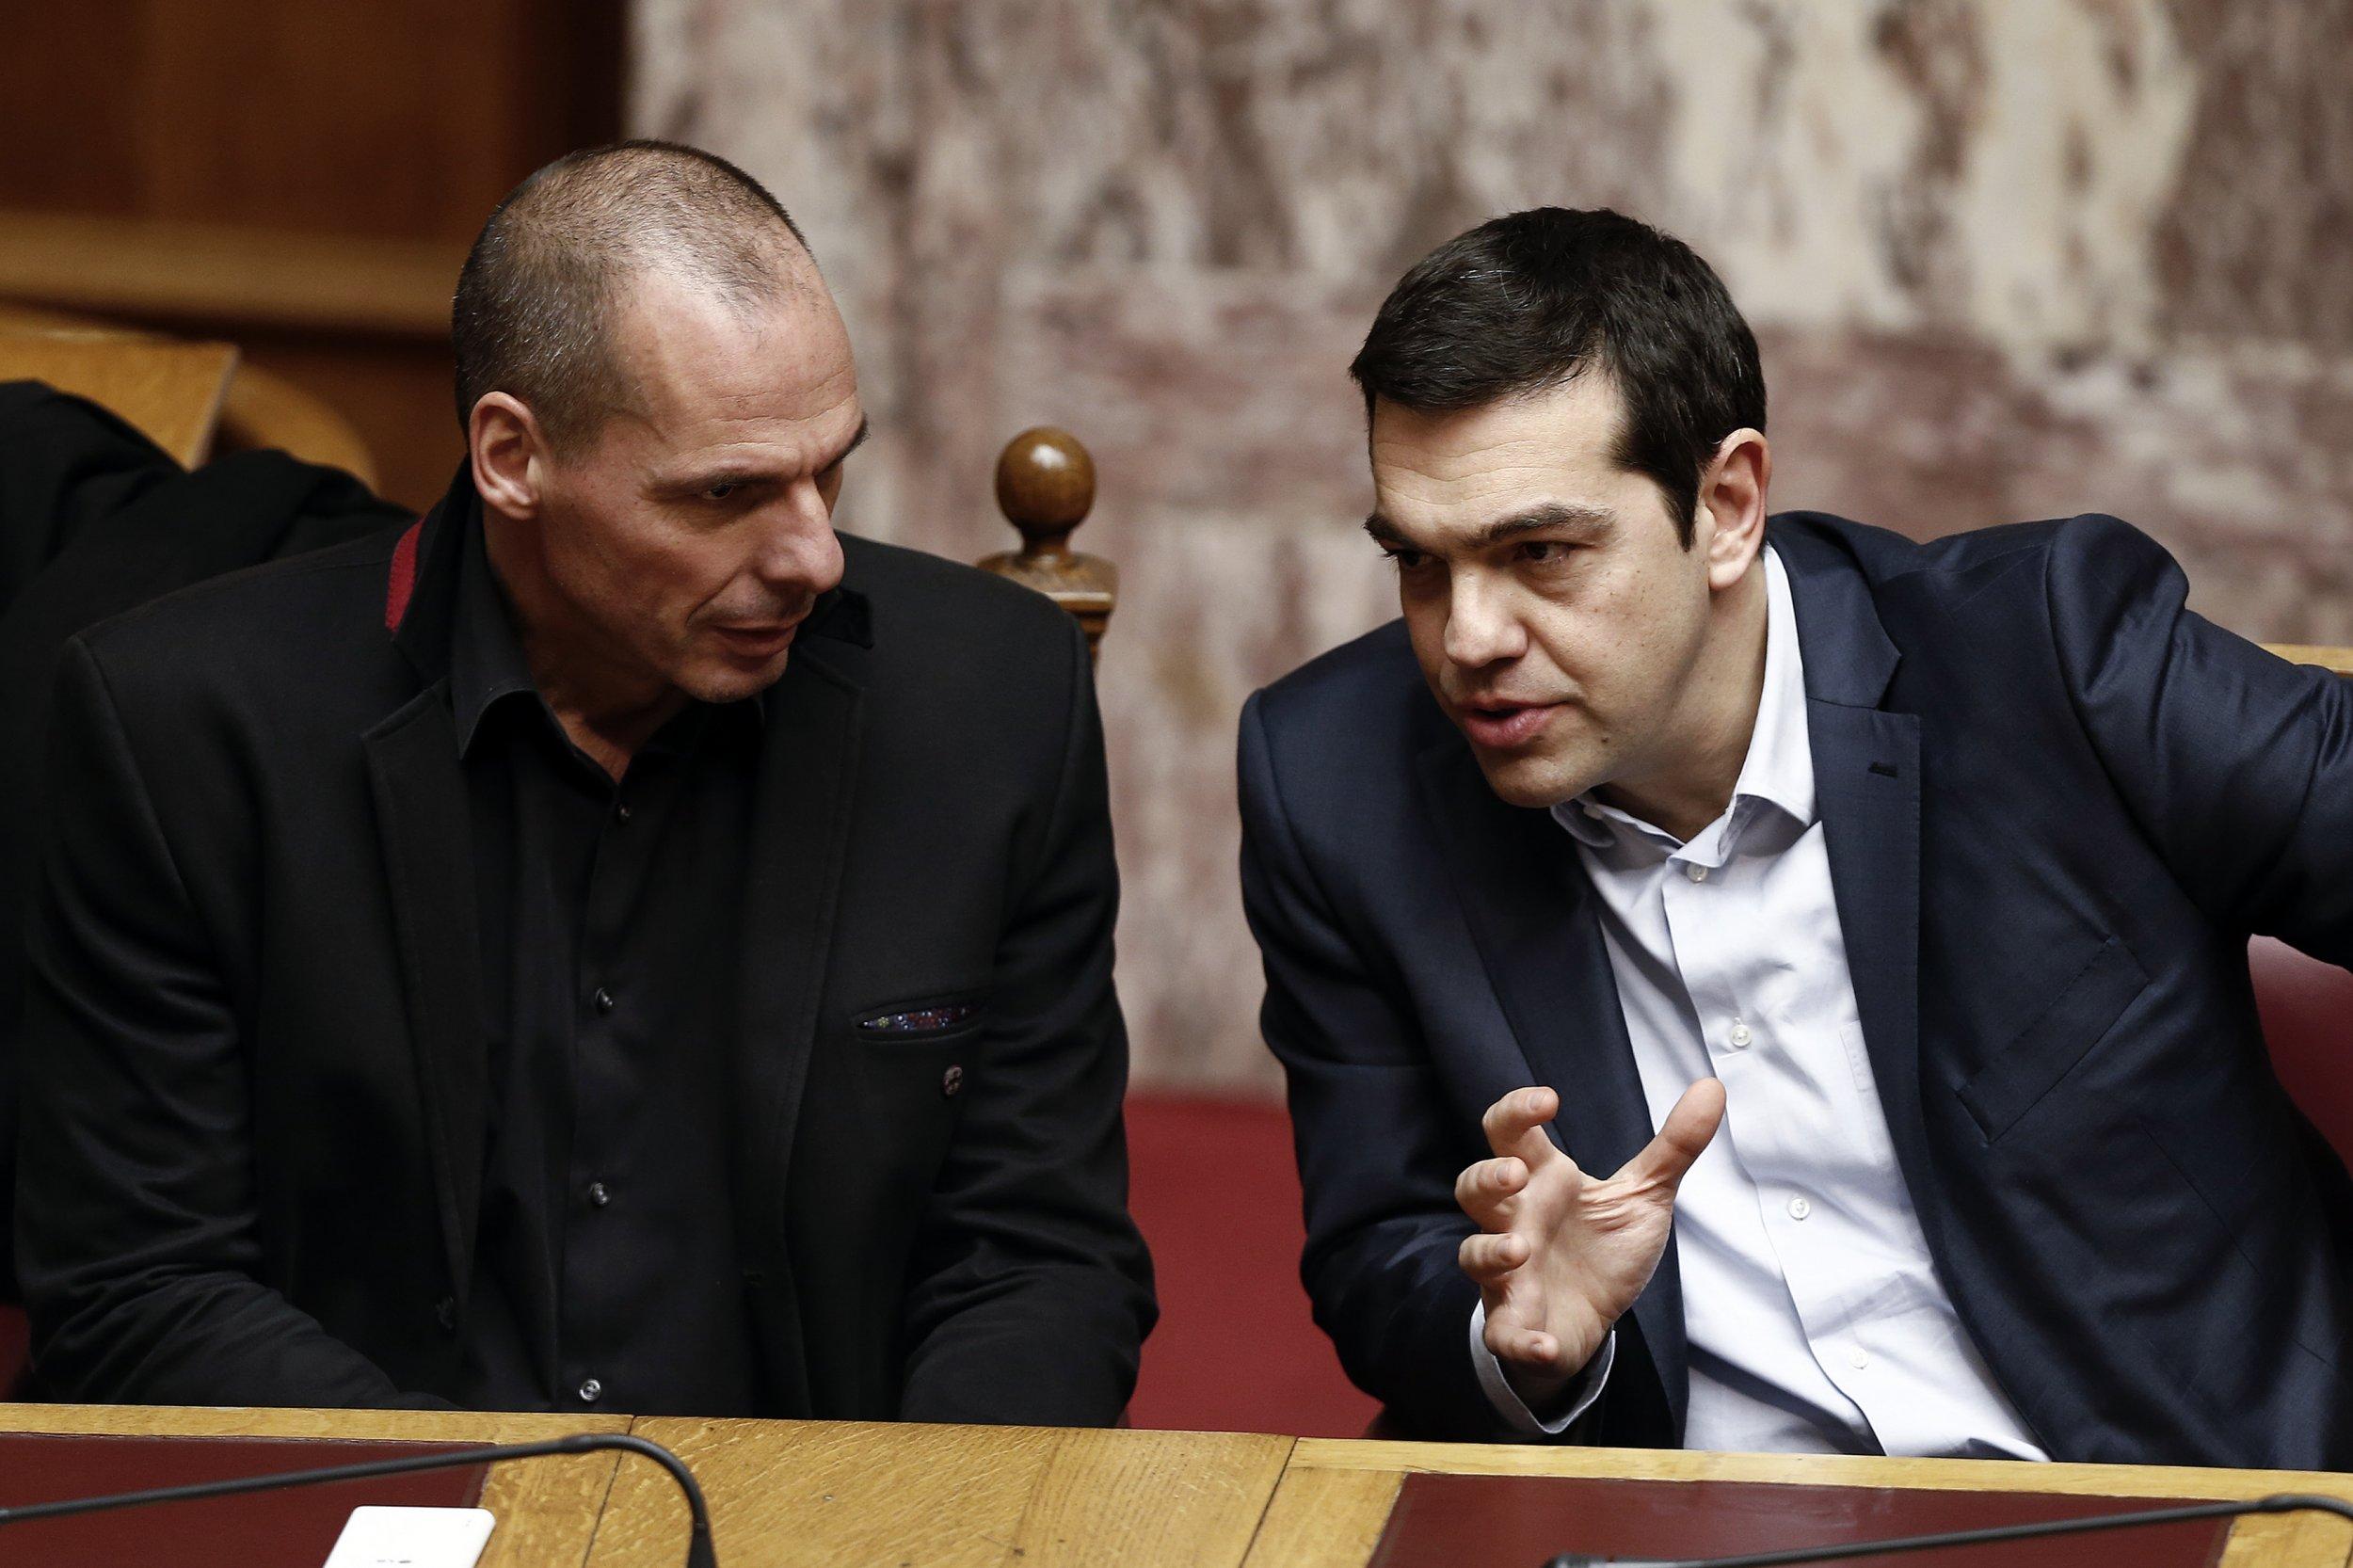 Tsipras and Varoufakis